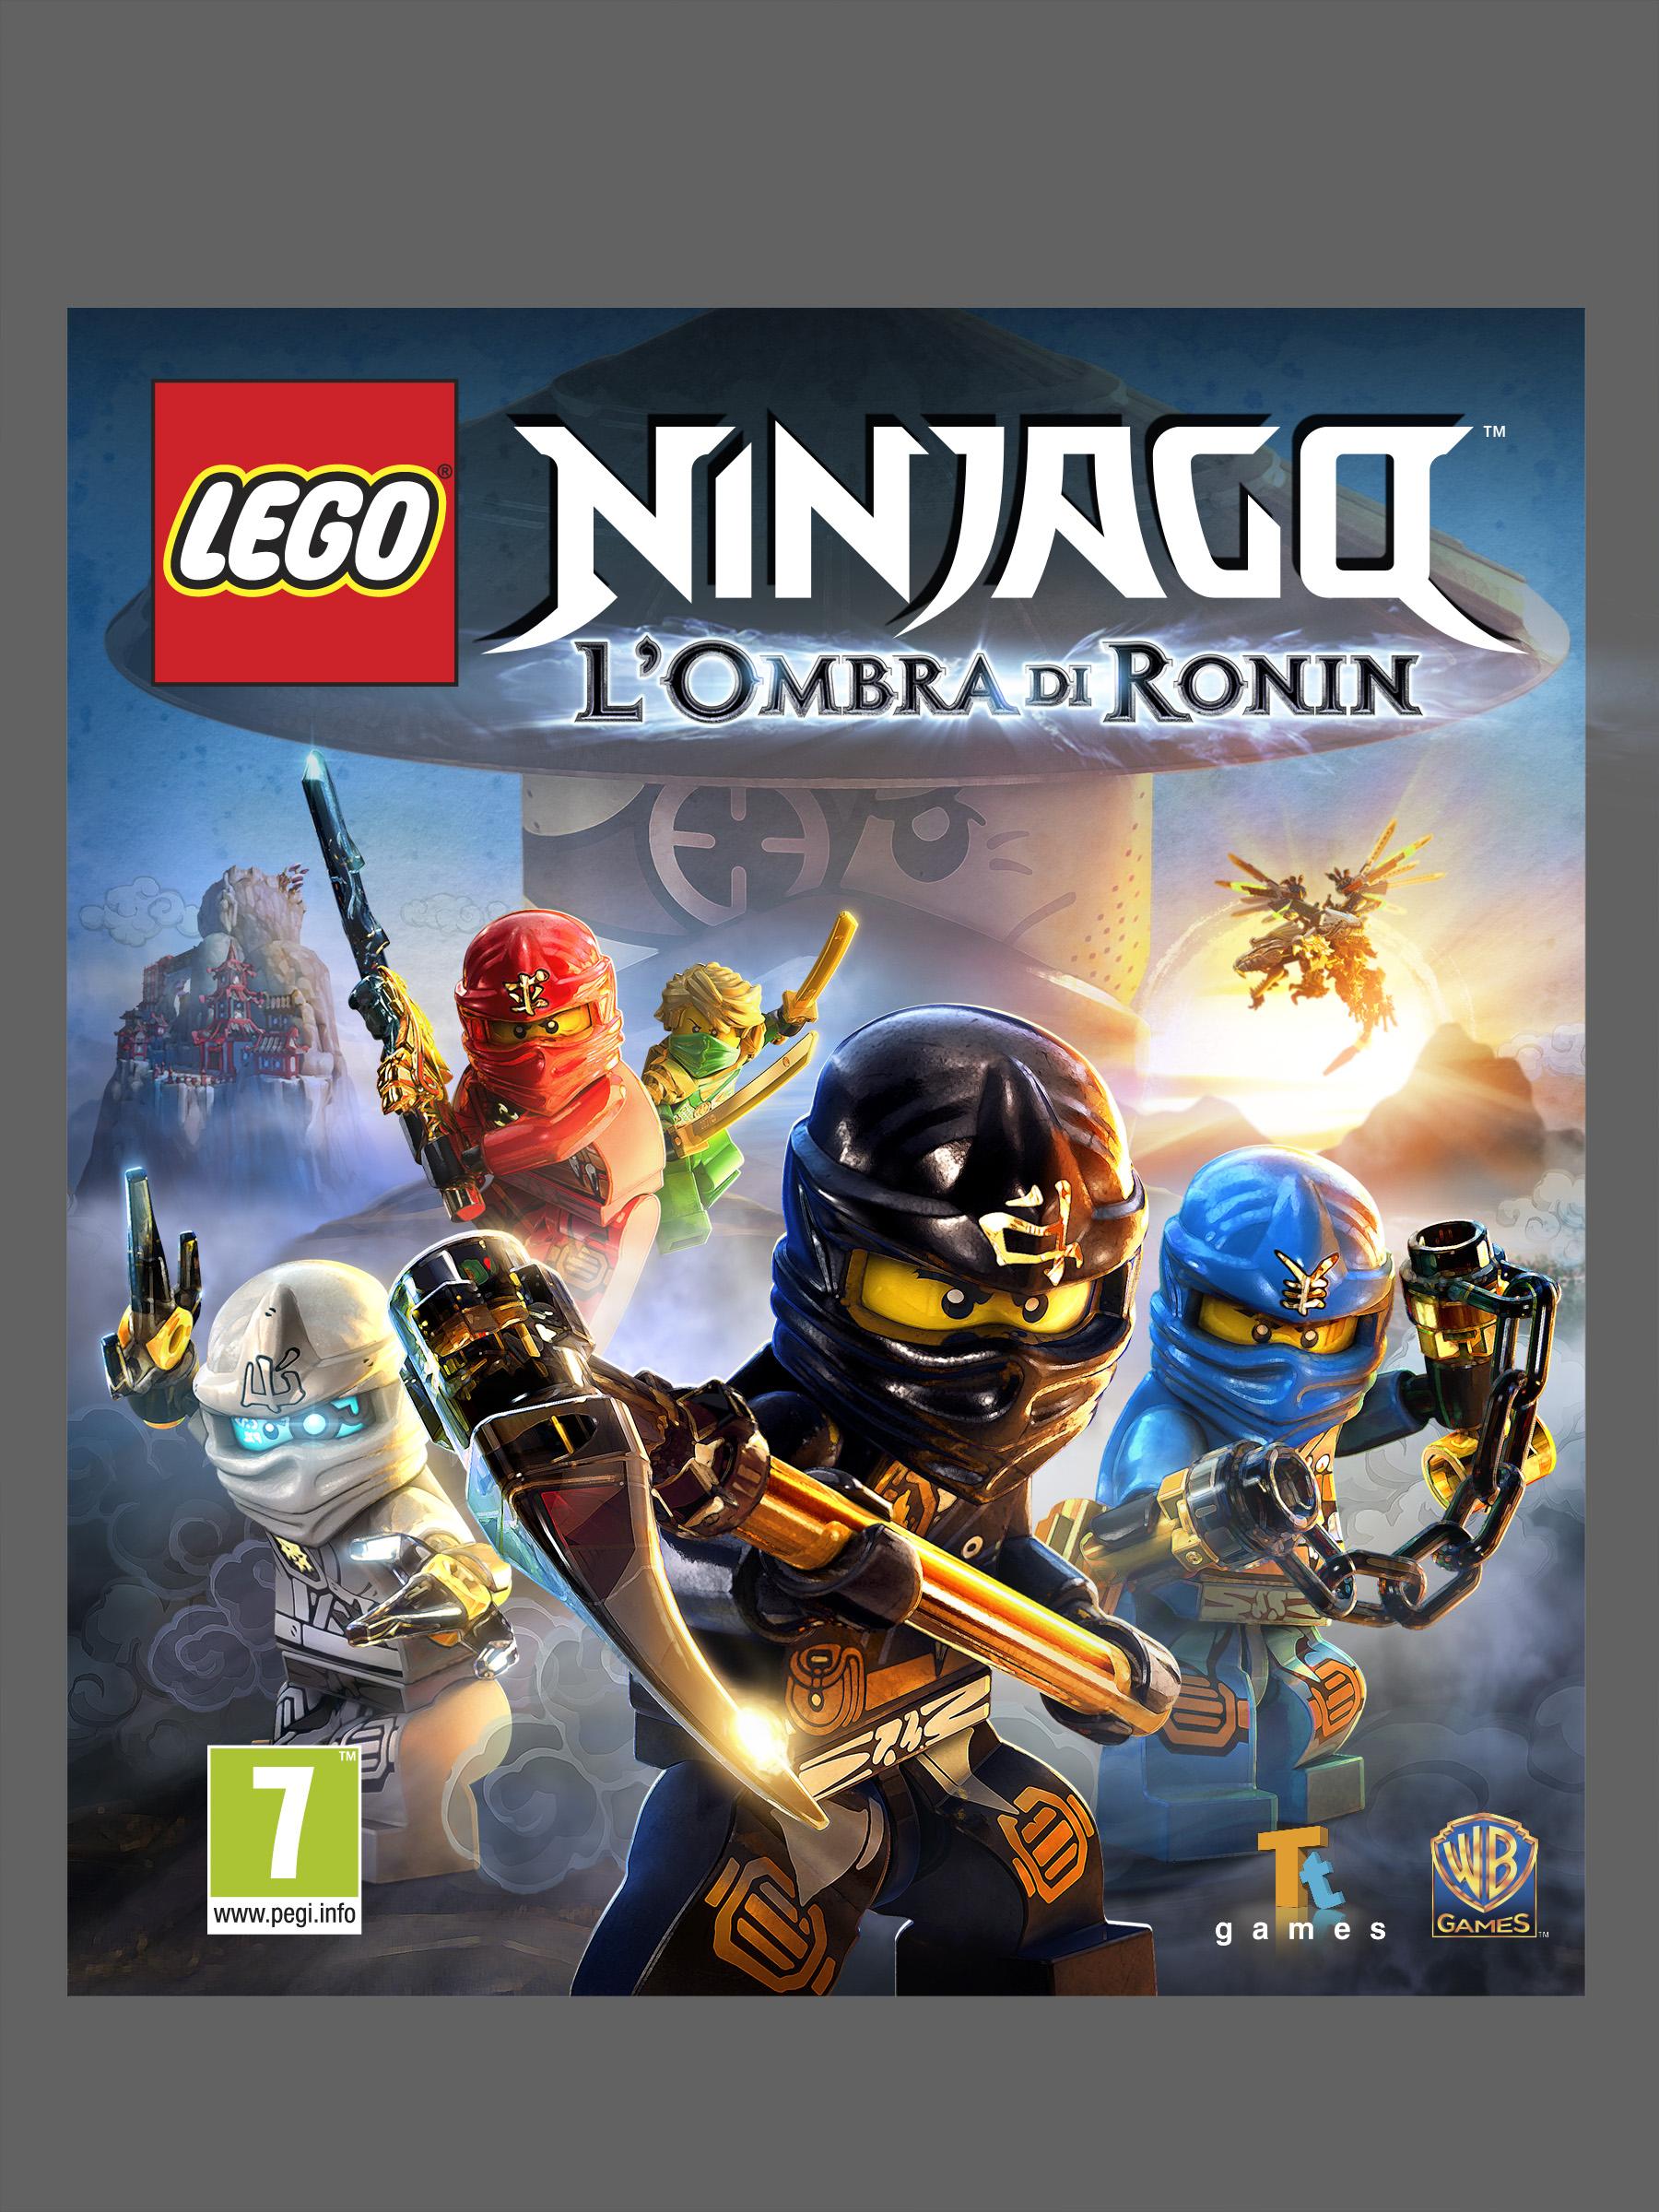 Ninjago  SofR KeyArt HR RGB 2a HalfSz_ITA